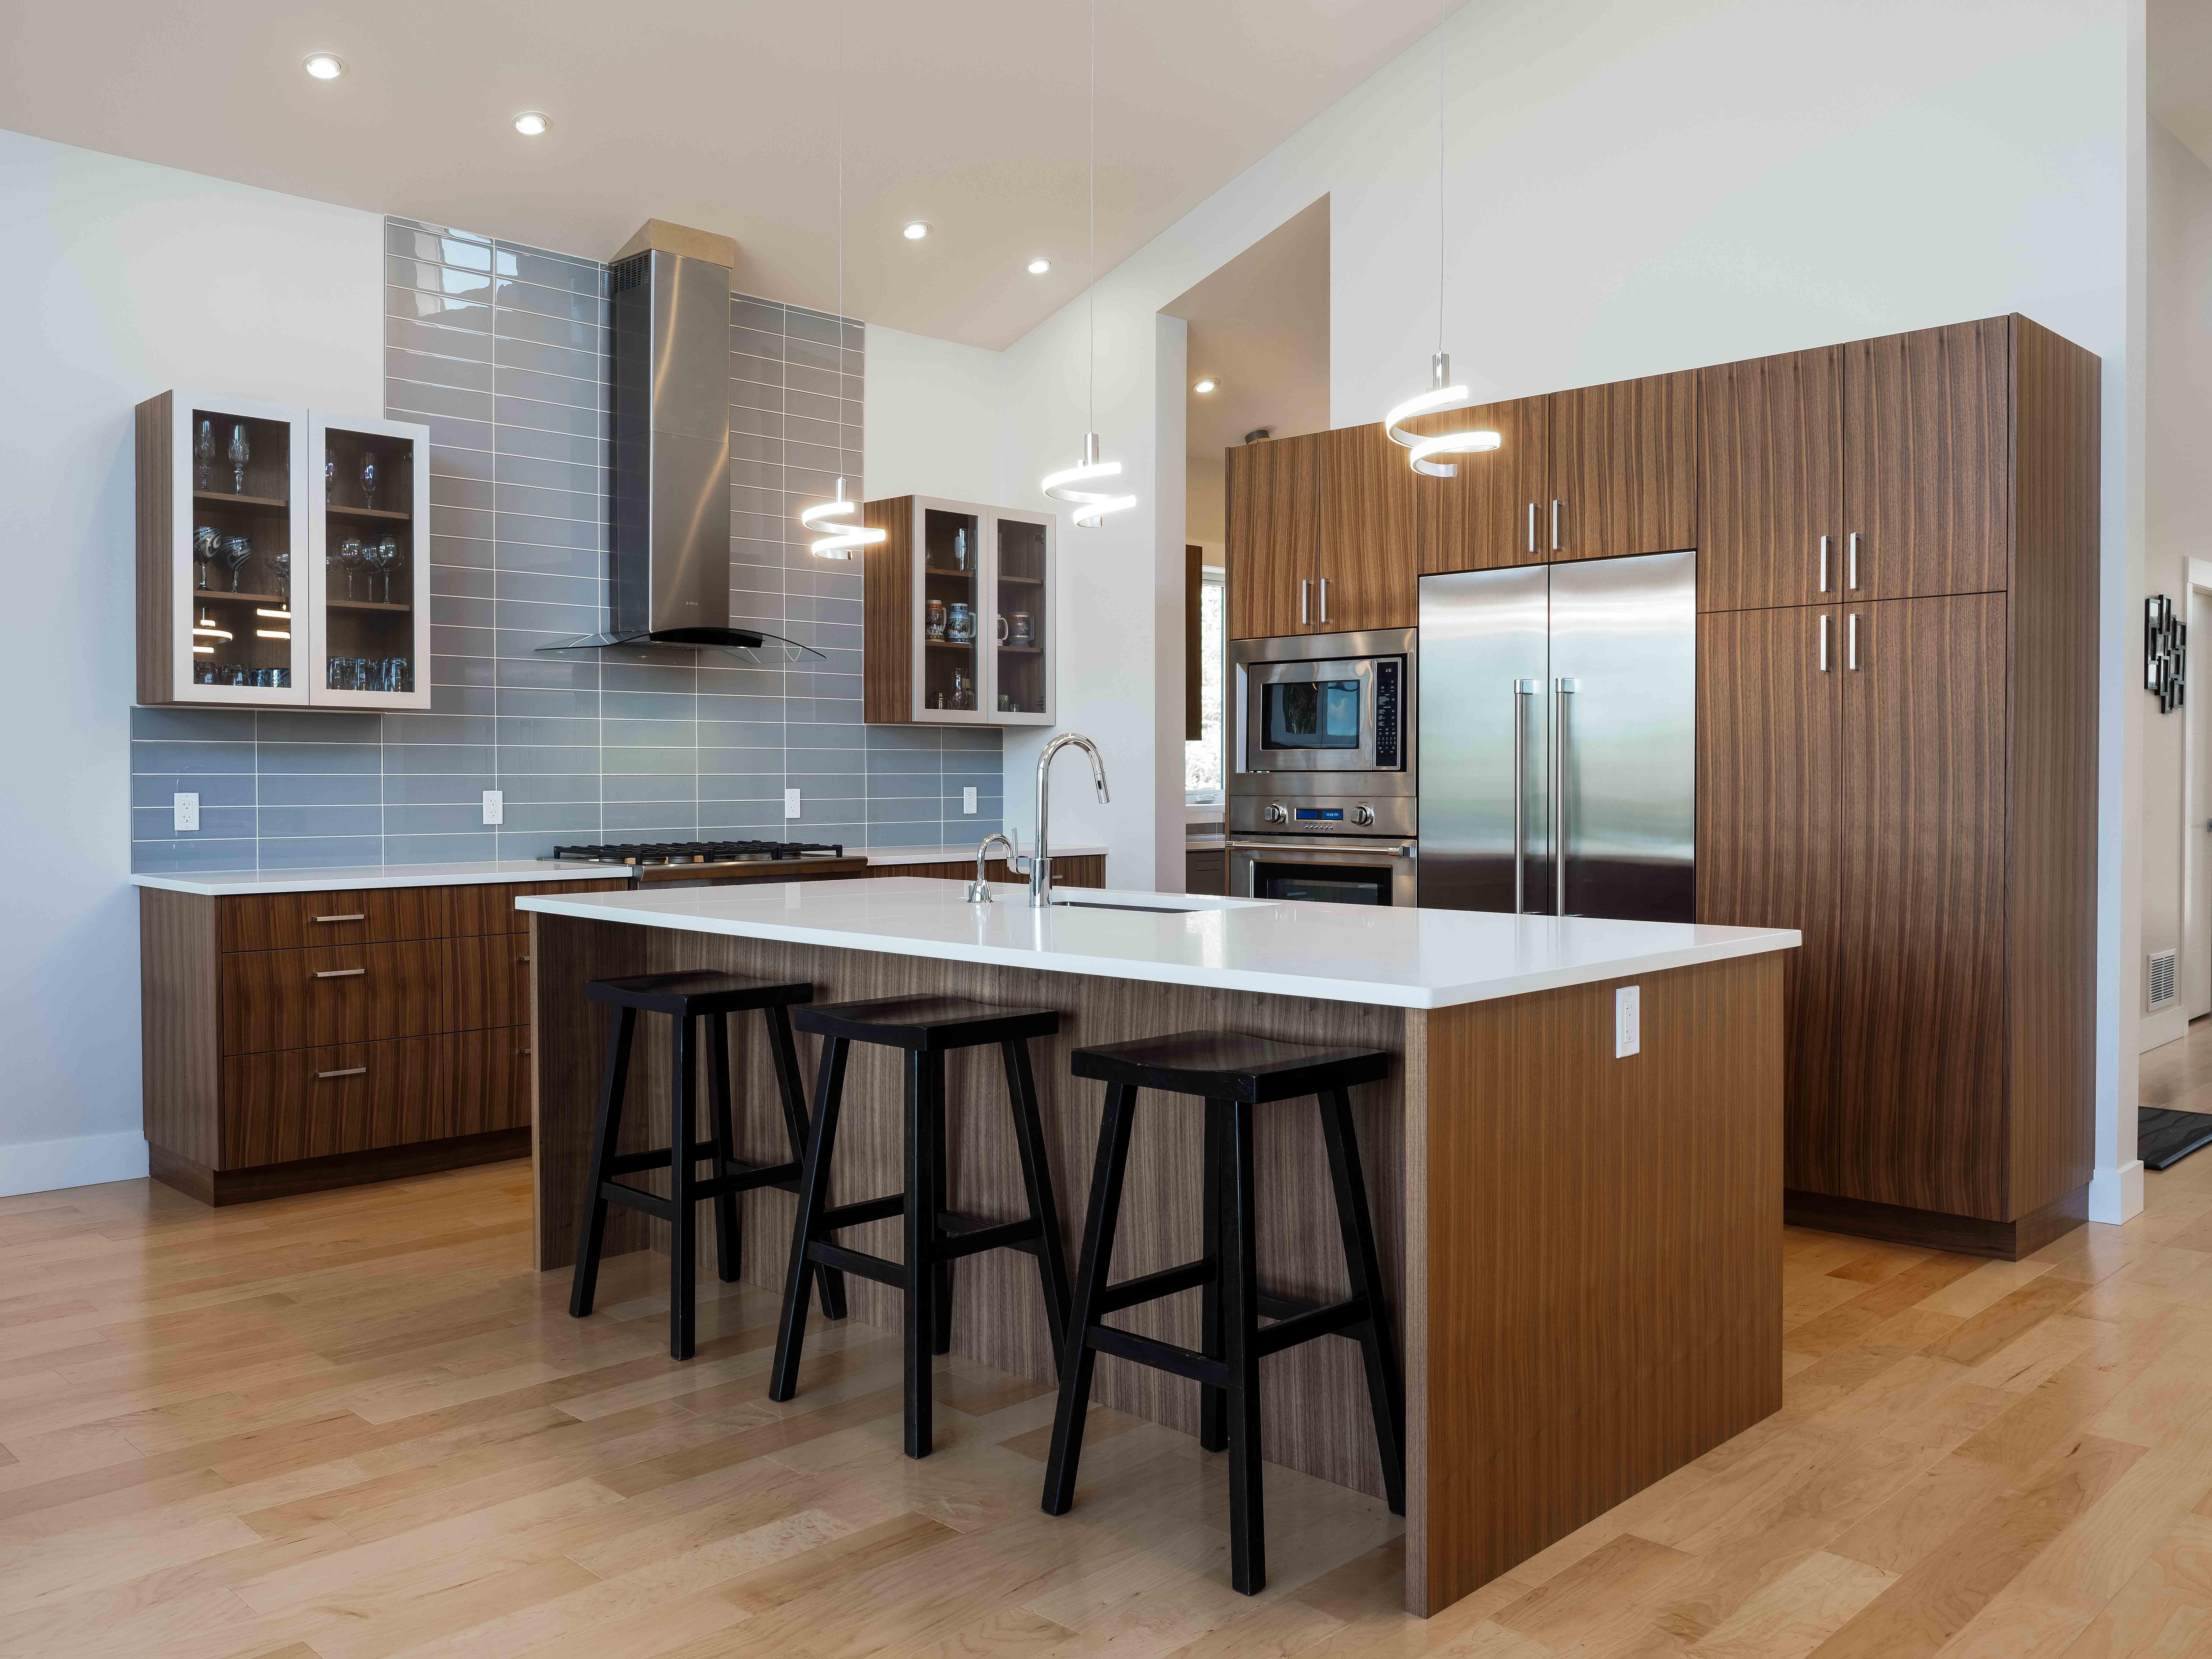 Heronwood Cabinets